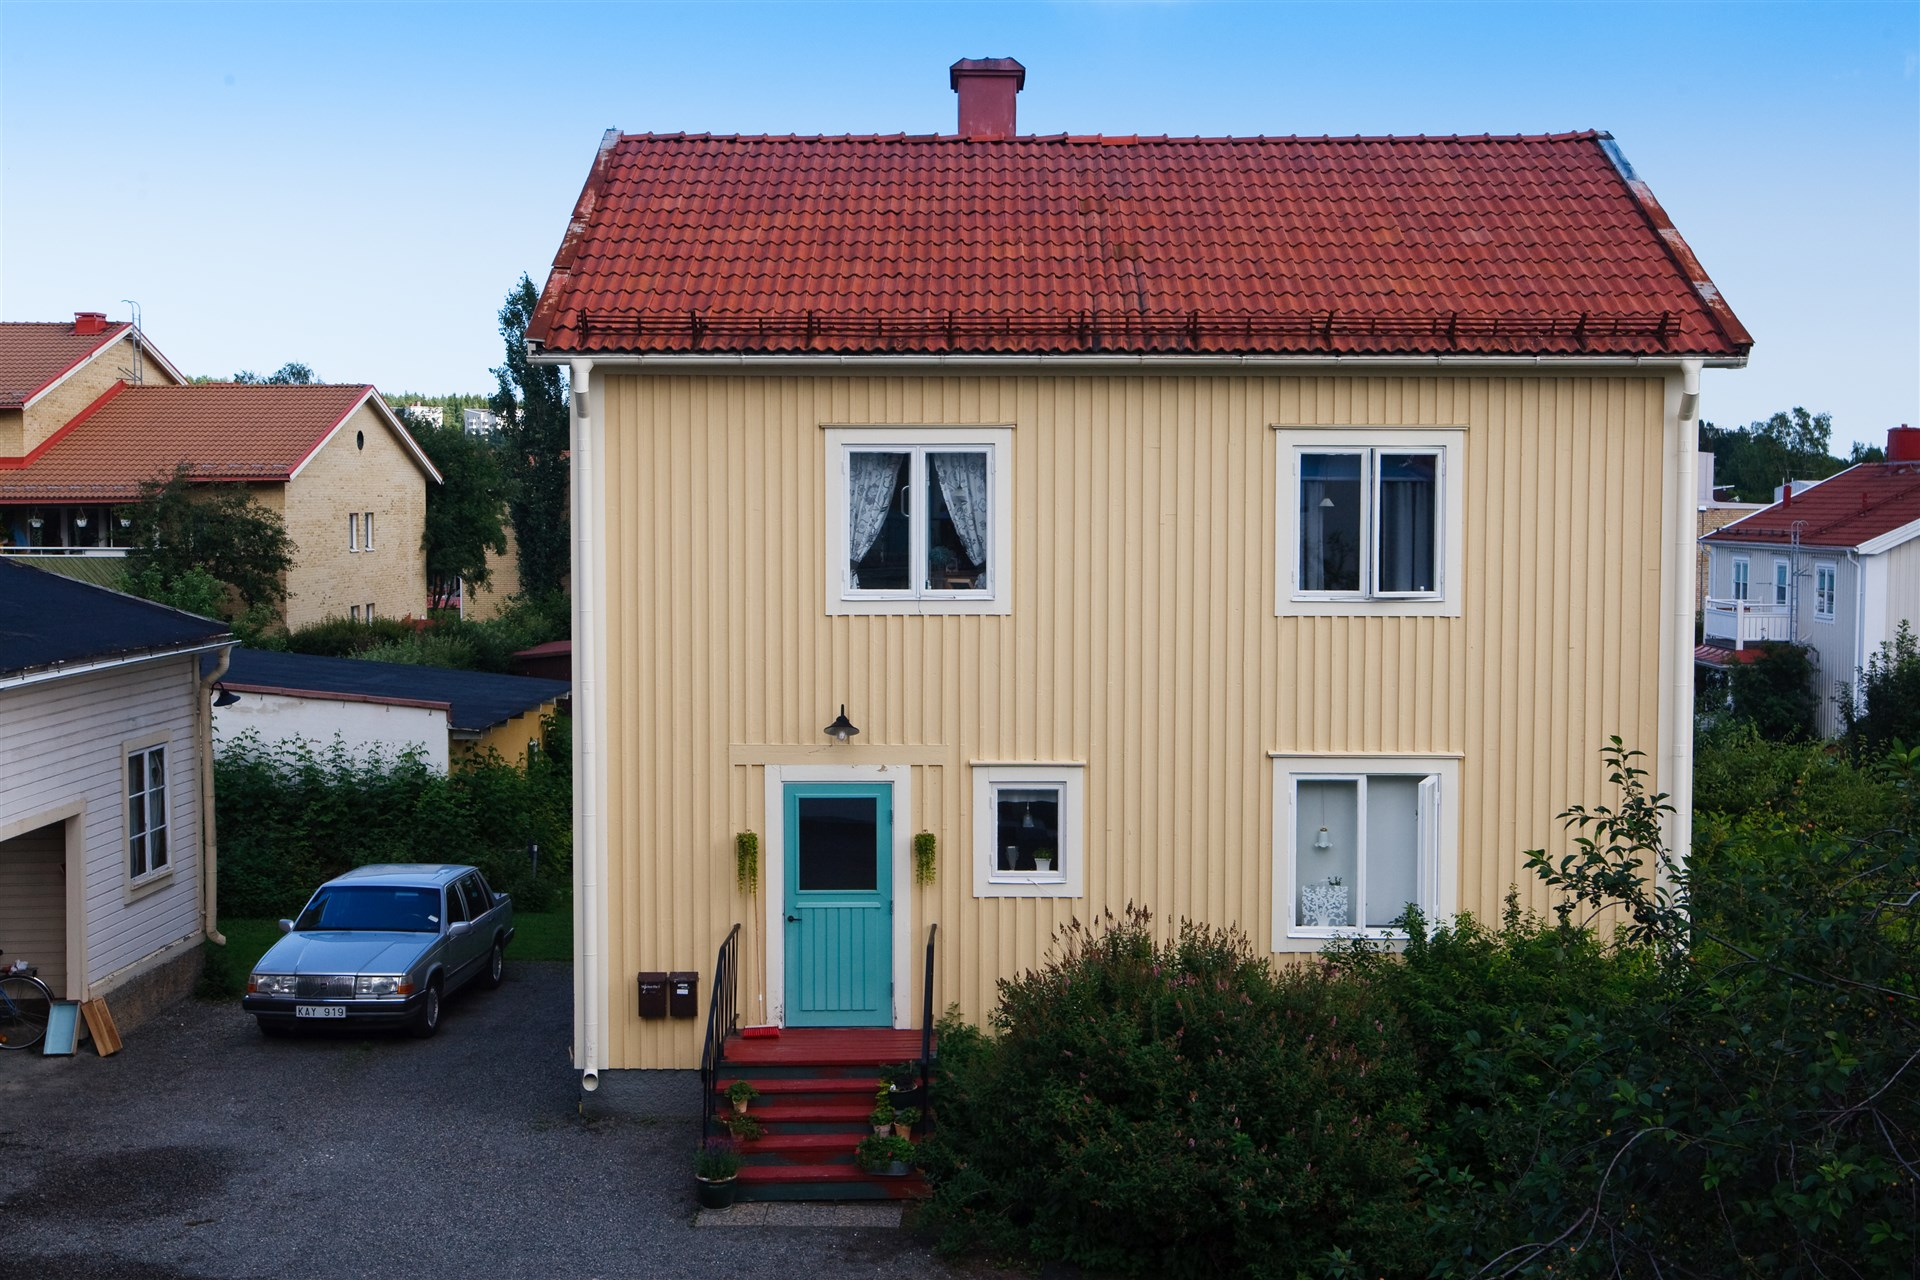 Gårdshus med 2 lägenheter